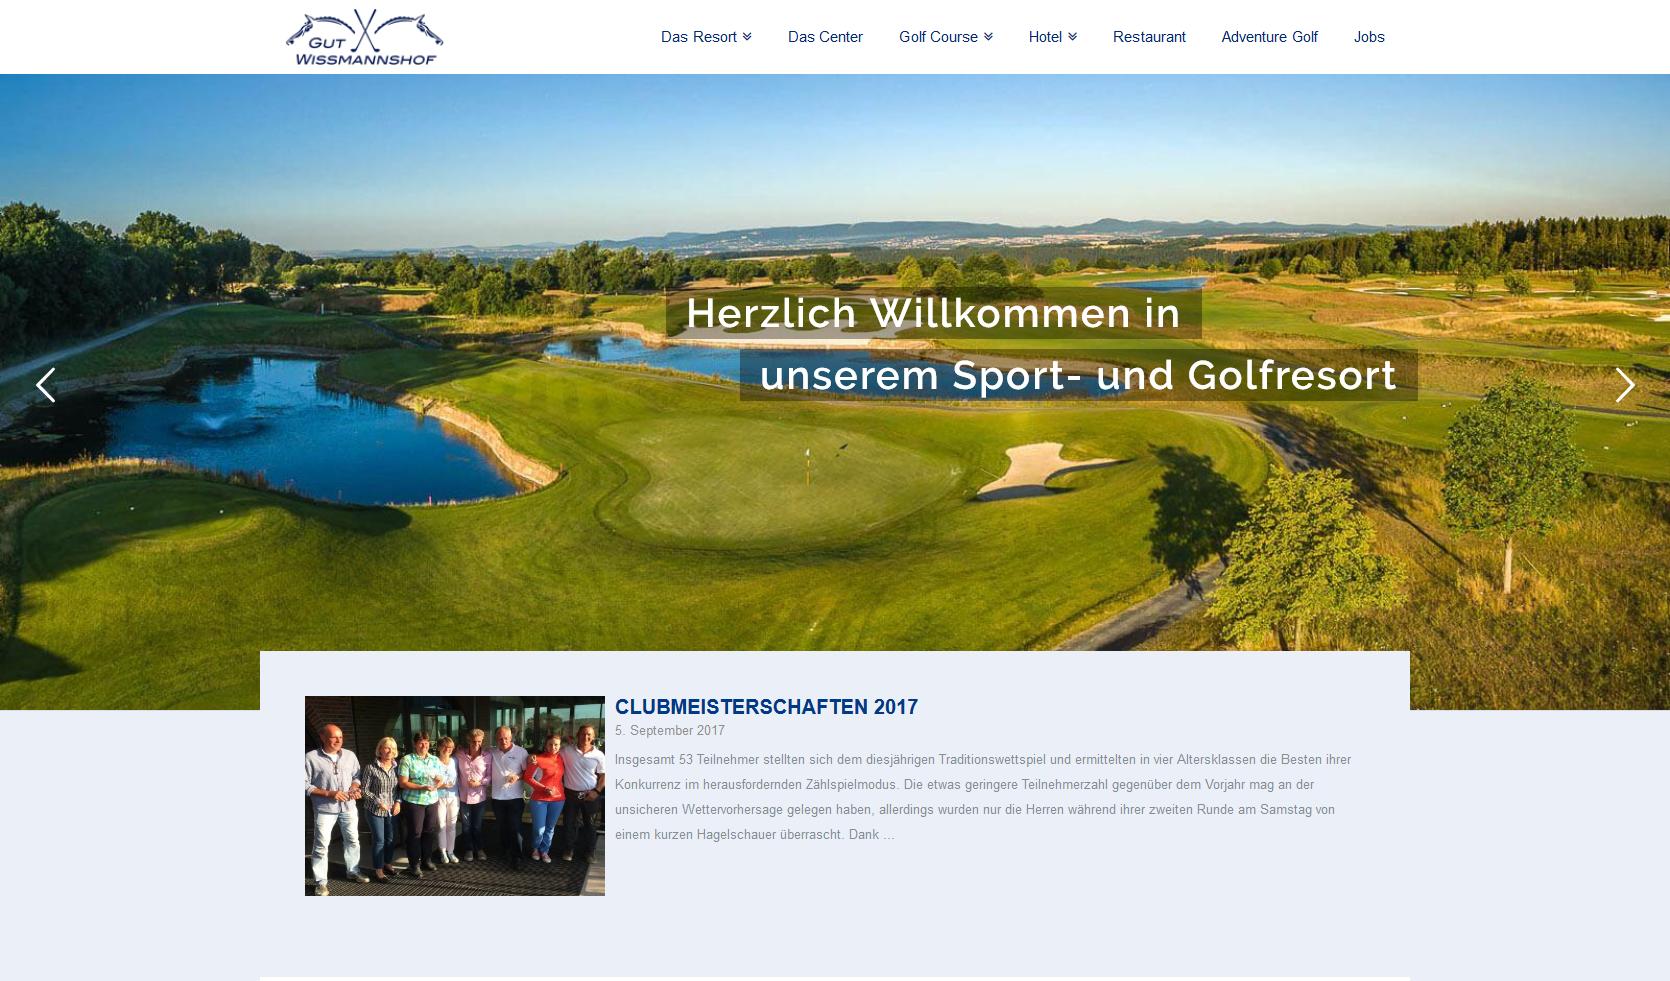 FireShot Capture 15 - Gut Wissmannshof I Ihr Sport- & Golfresort in S_ - http___www.wissmannshof.de_